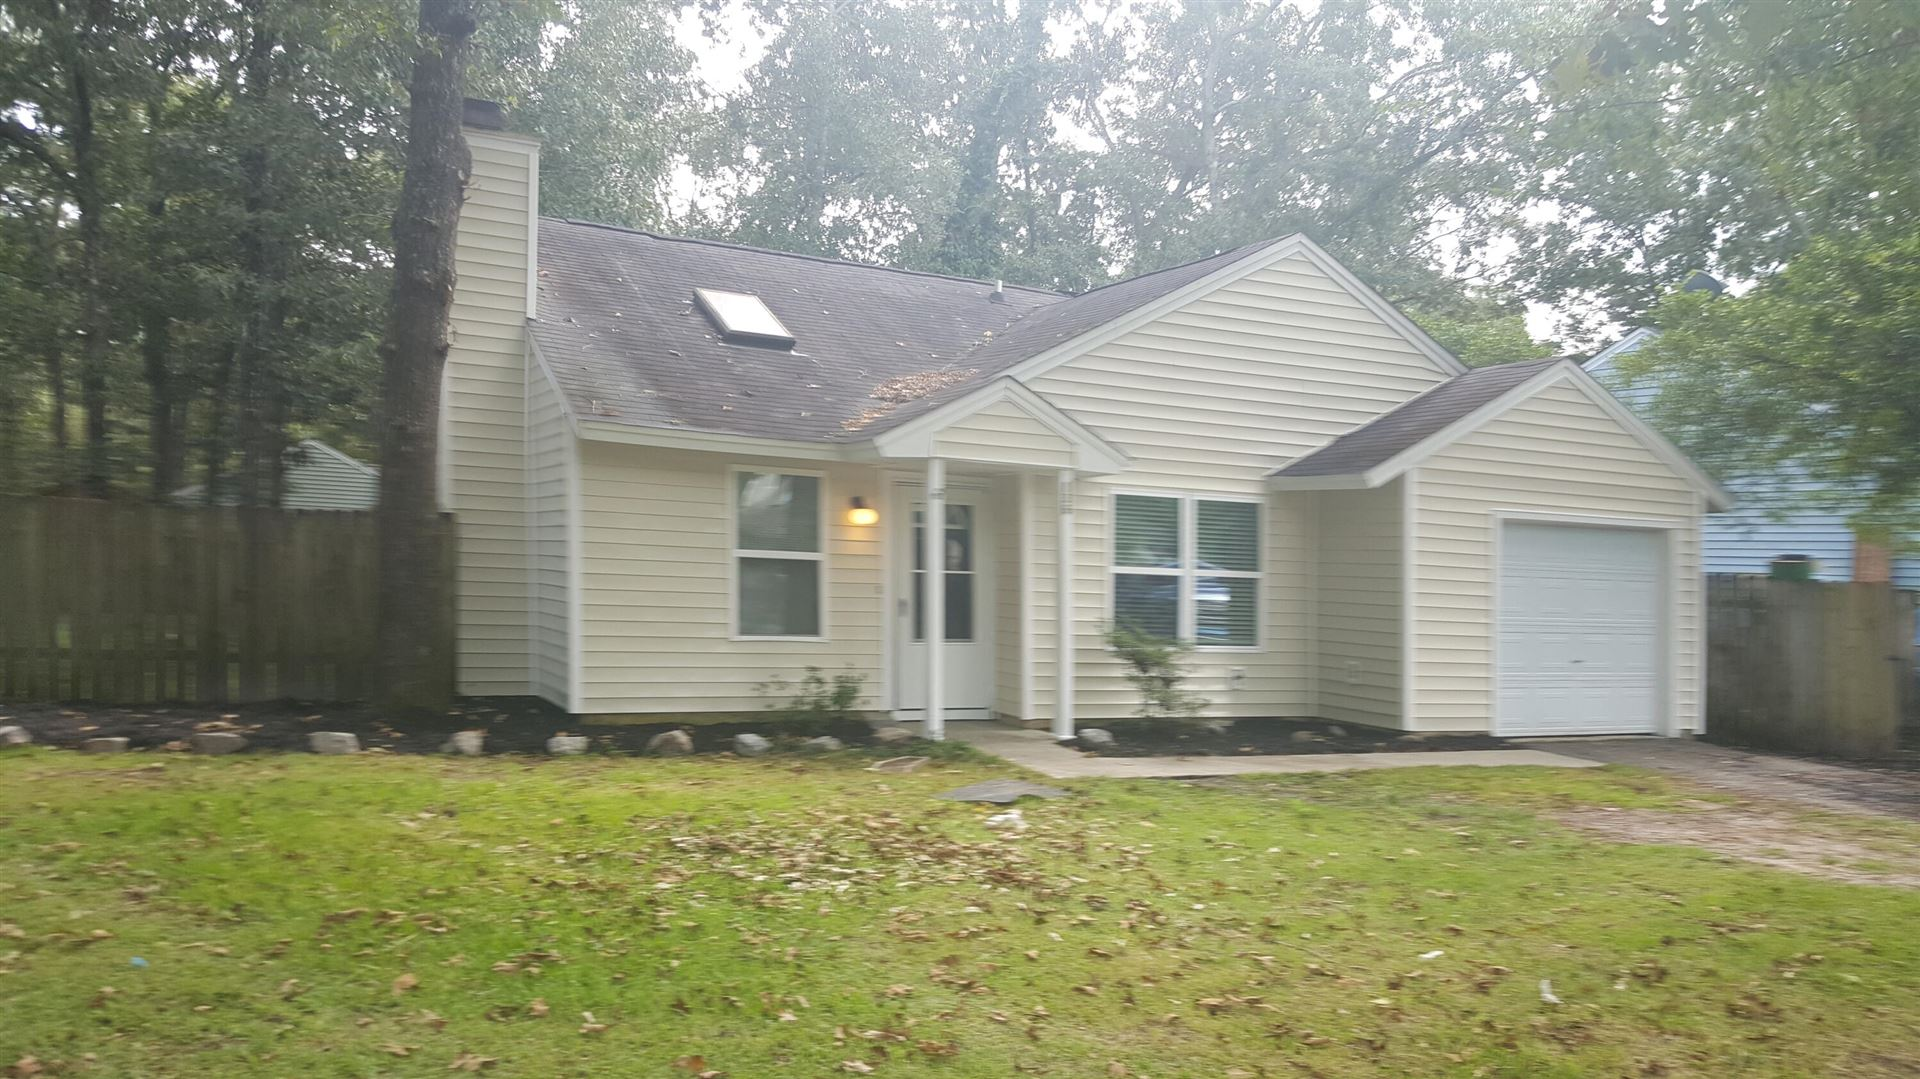 Photo of 136 Tabby Creek Circle, Summerville, SC 29486 (MLS # 21028681)